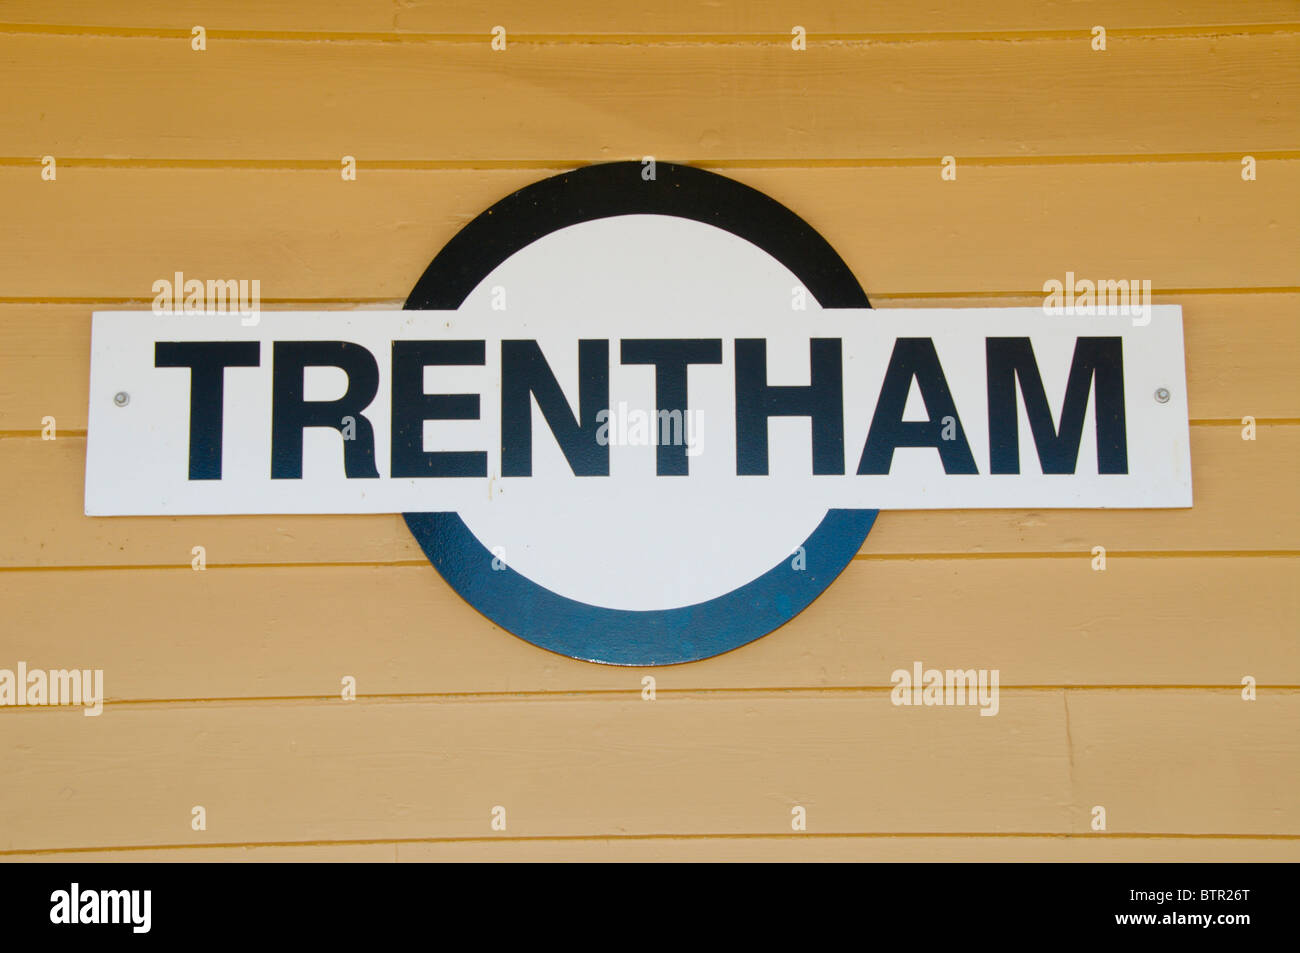 Australia, Central Victoria, Trentham station sign - Stock Image